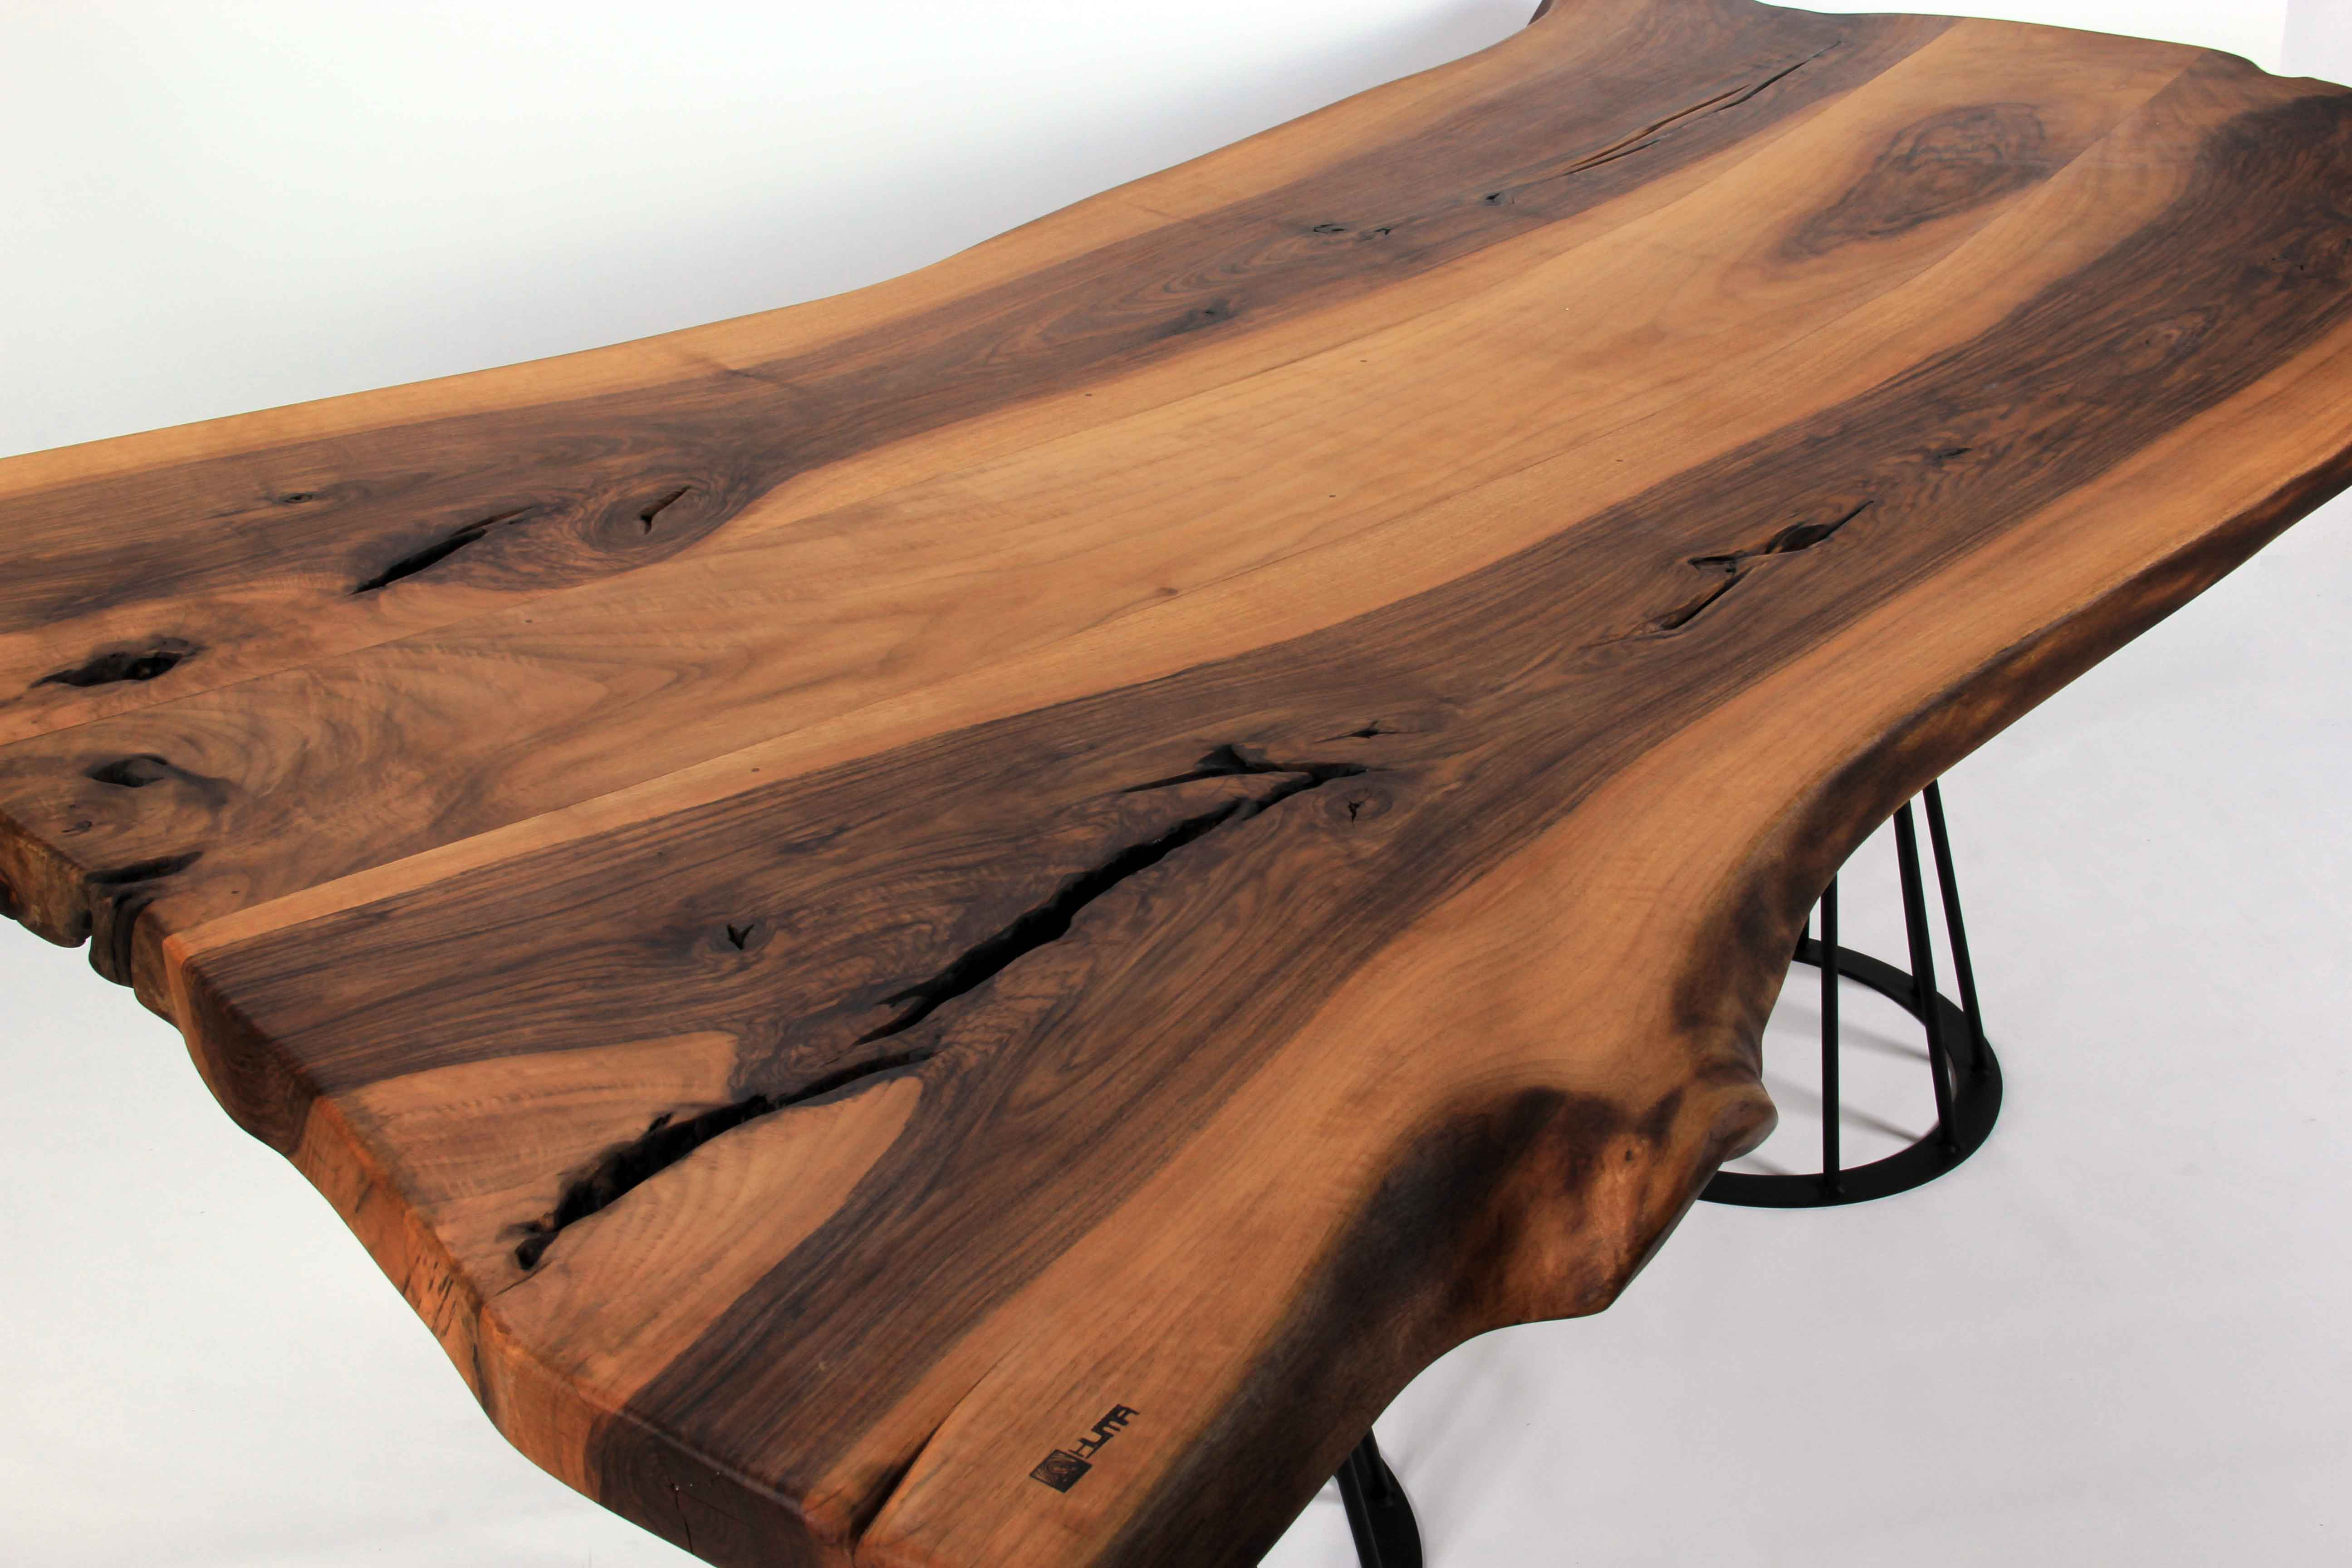 Masa üstü ahşaptan yapılmış - anlatma